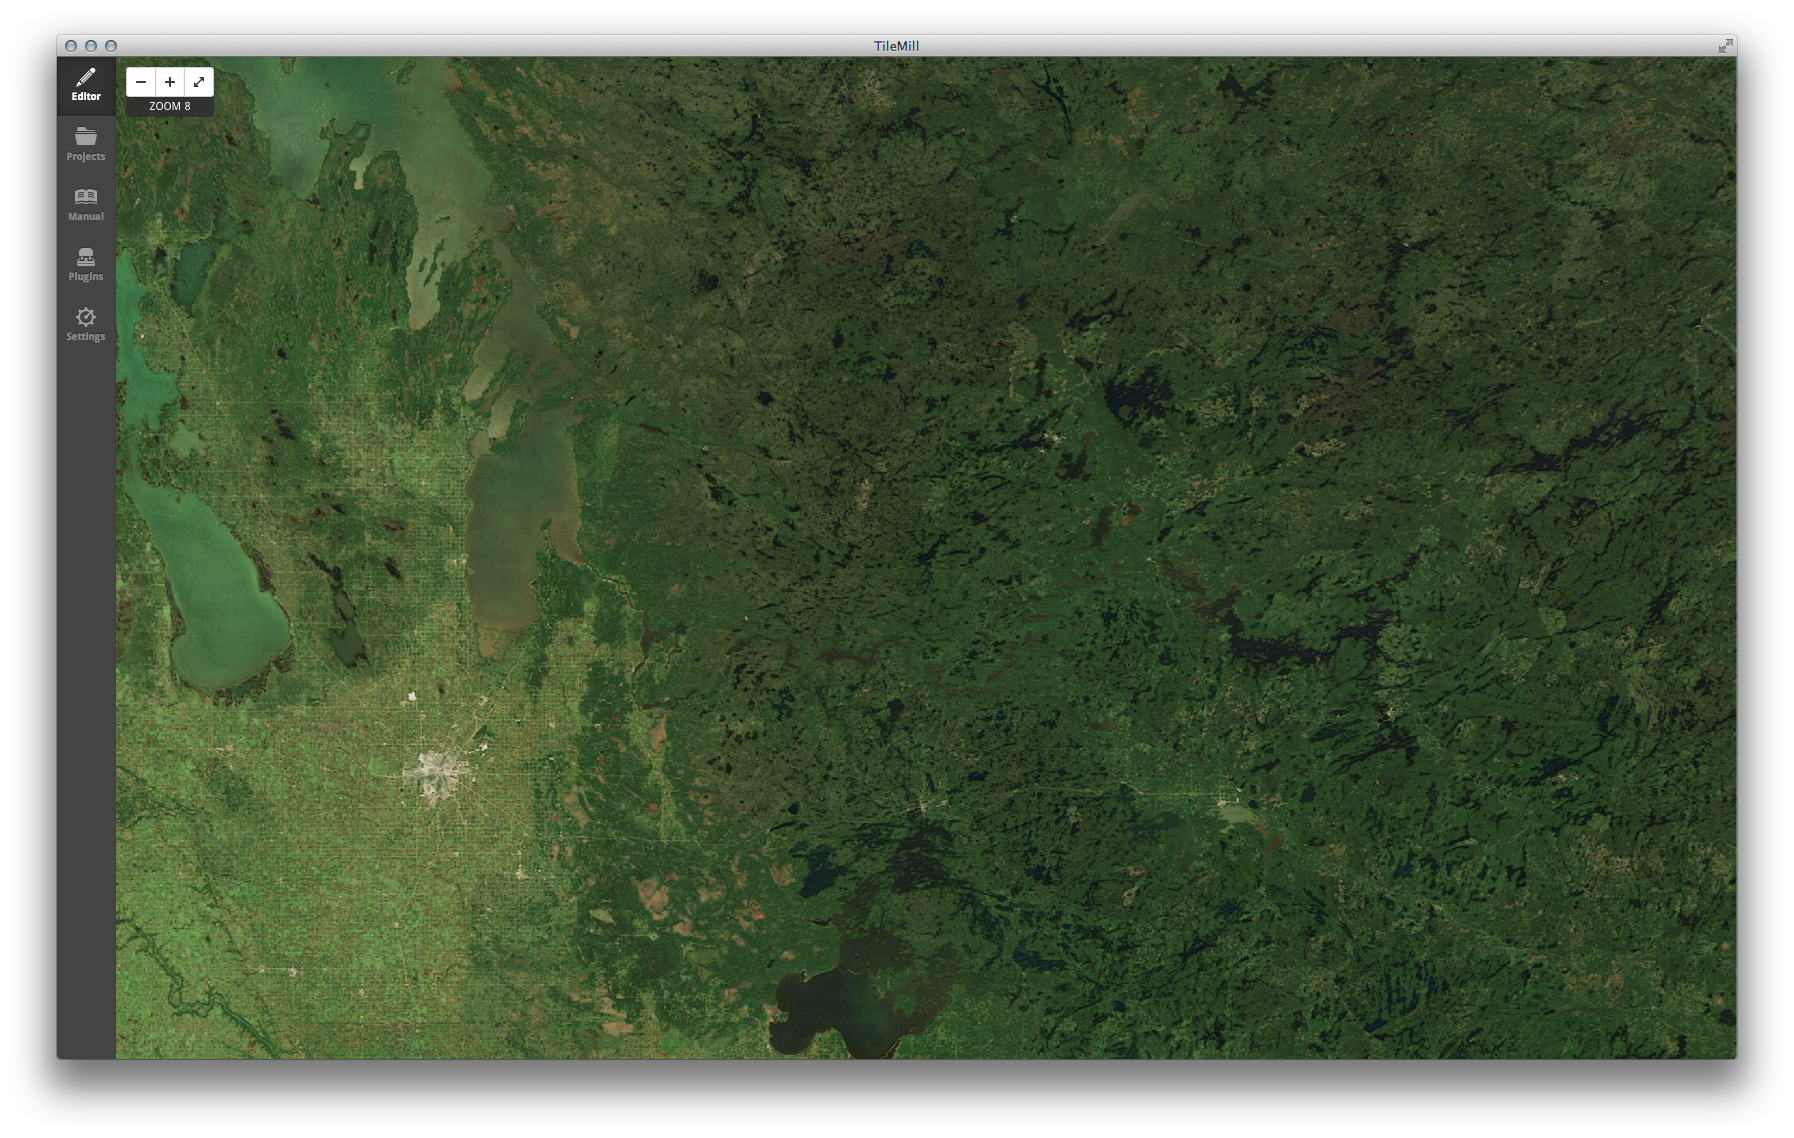 Winnipeg, Canada (latitude 49.9, longitude −91.1